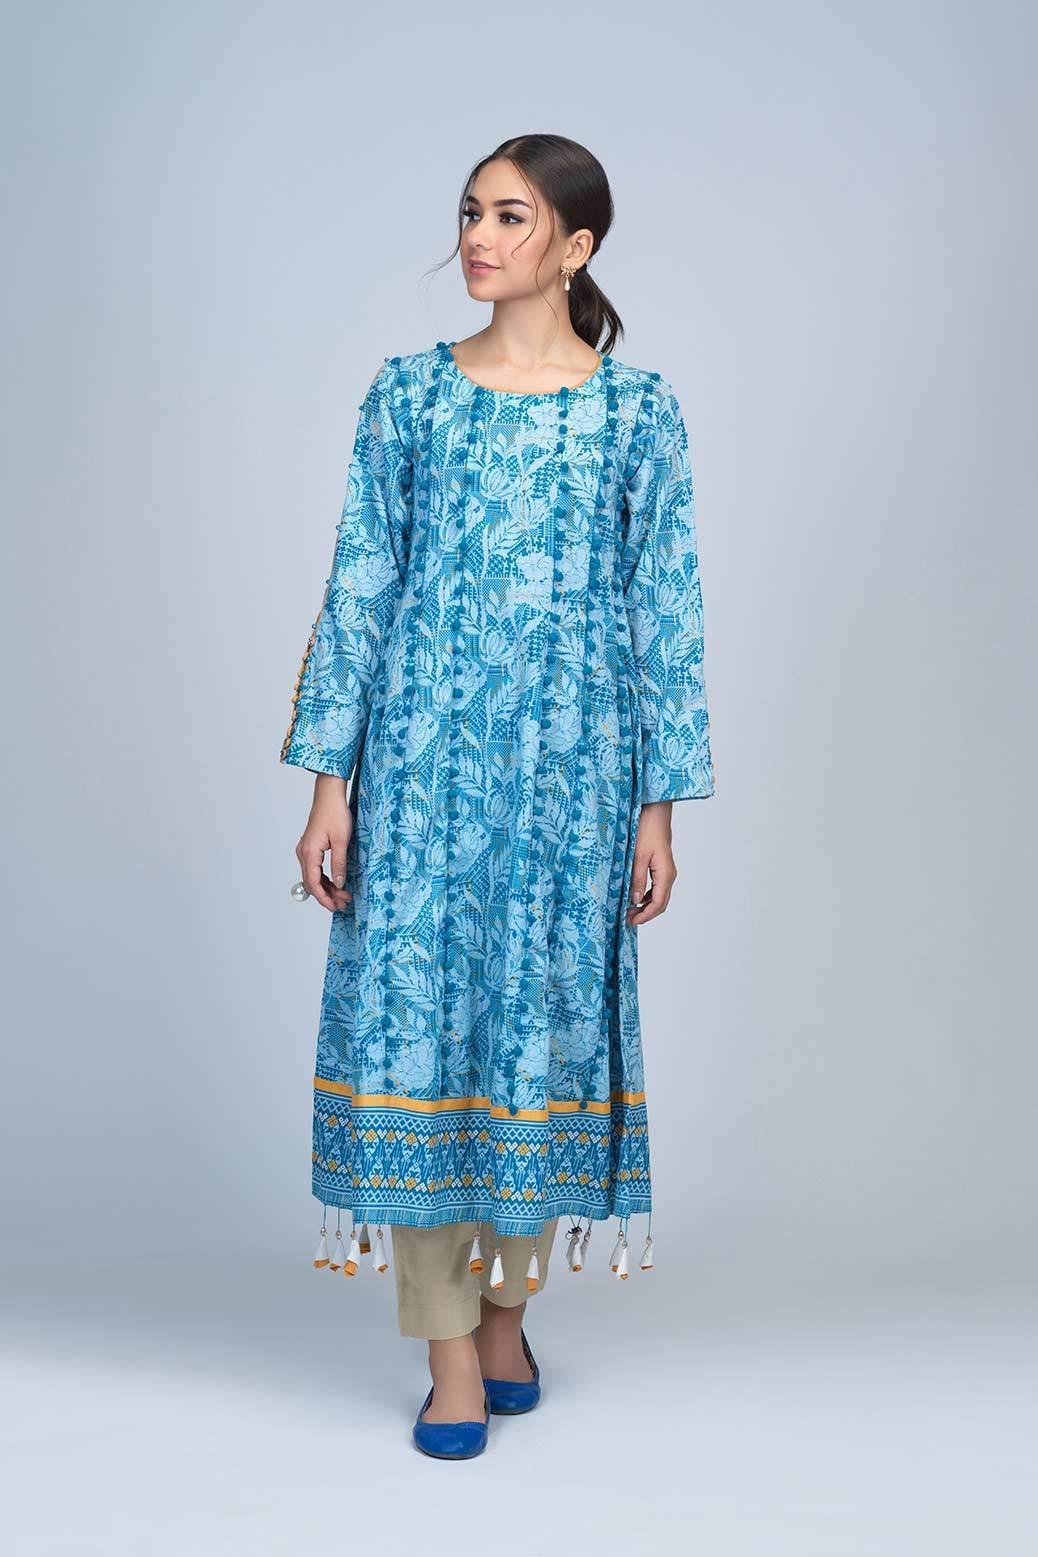 Bonanza Satrangi Winter Unstitched Dress Sky blue color